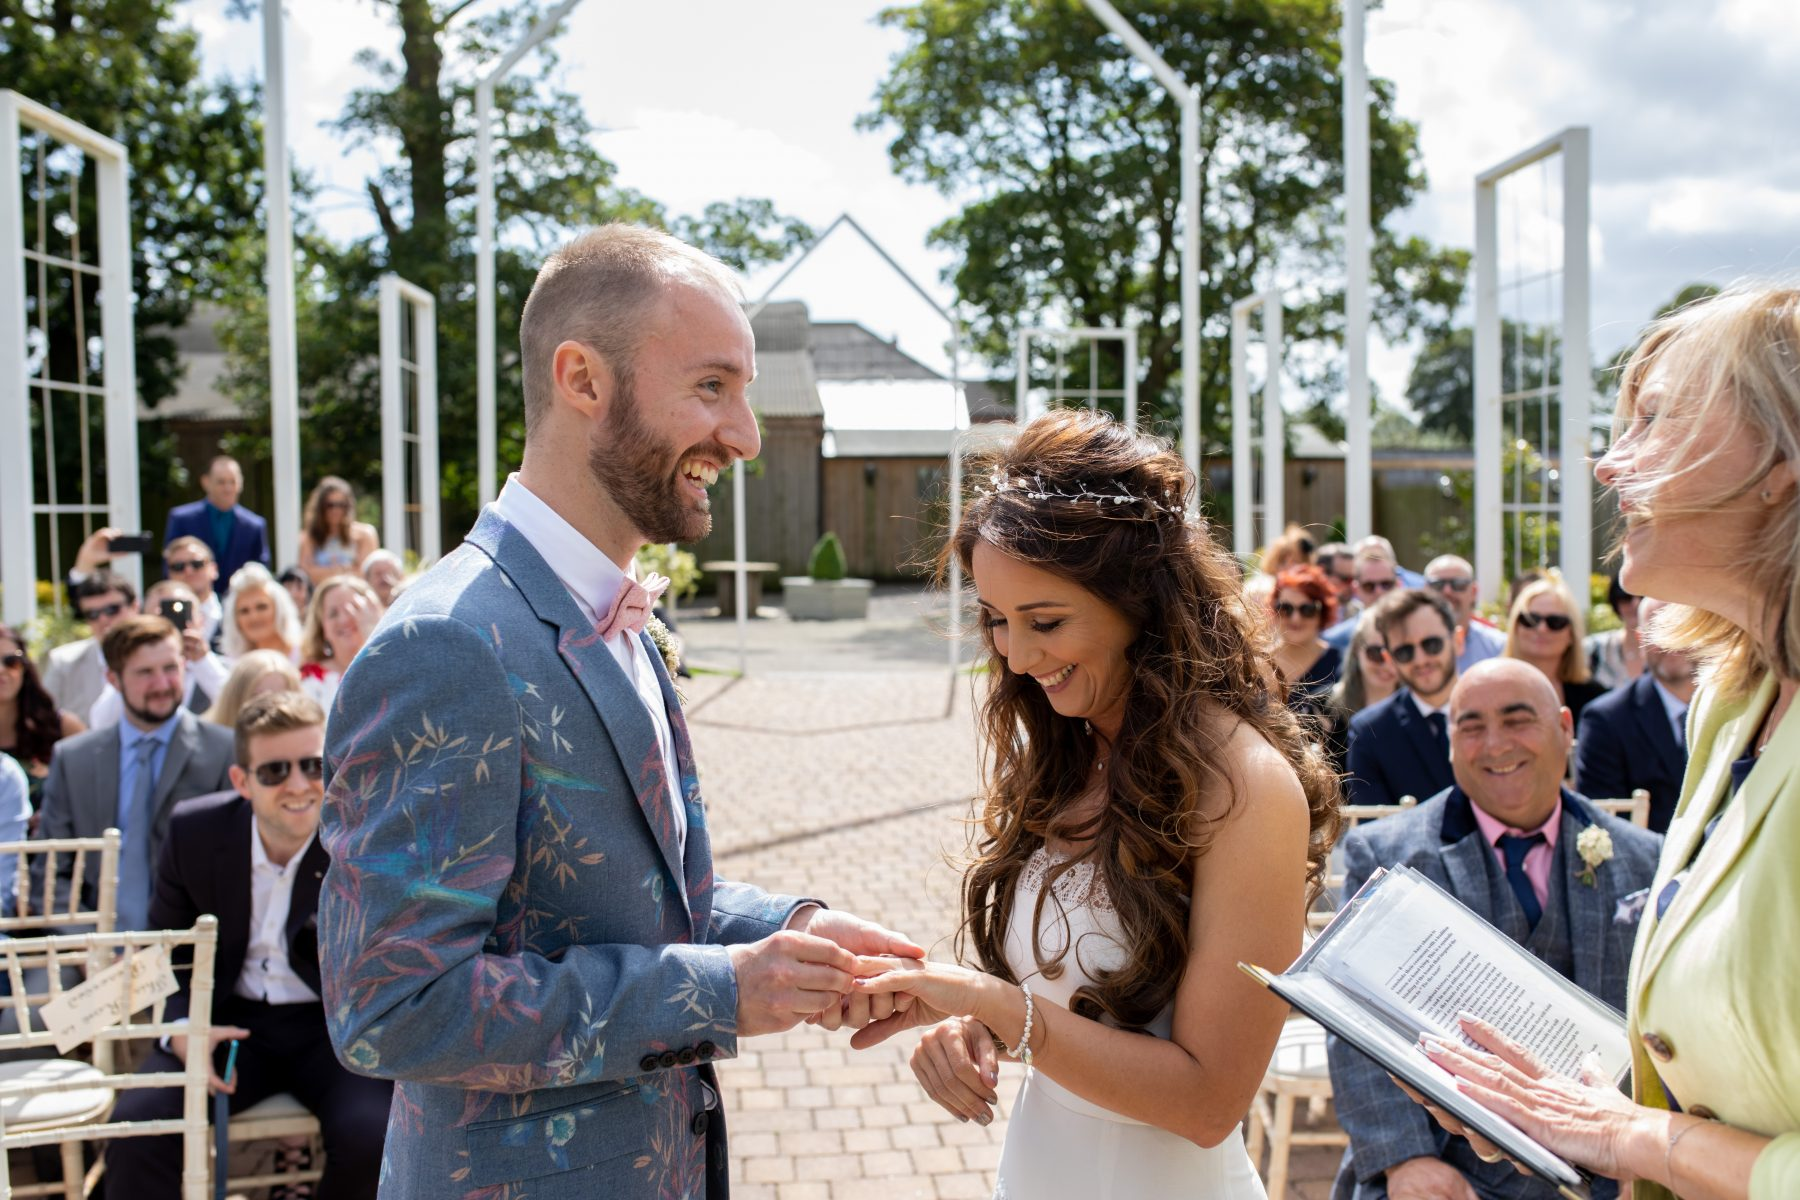 How to achieve beautiful outdoor wedding photos